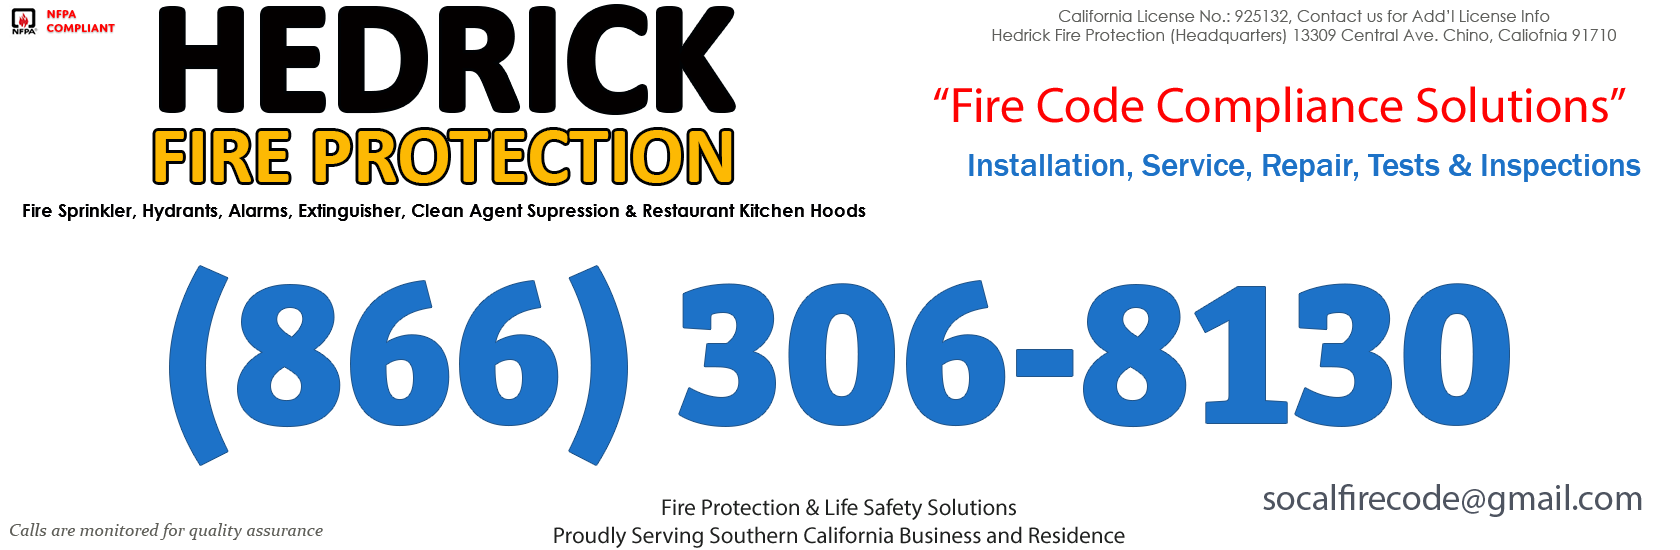 Victorville, California Fire Sprinkler Service Company